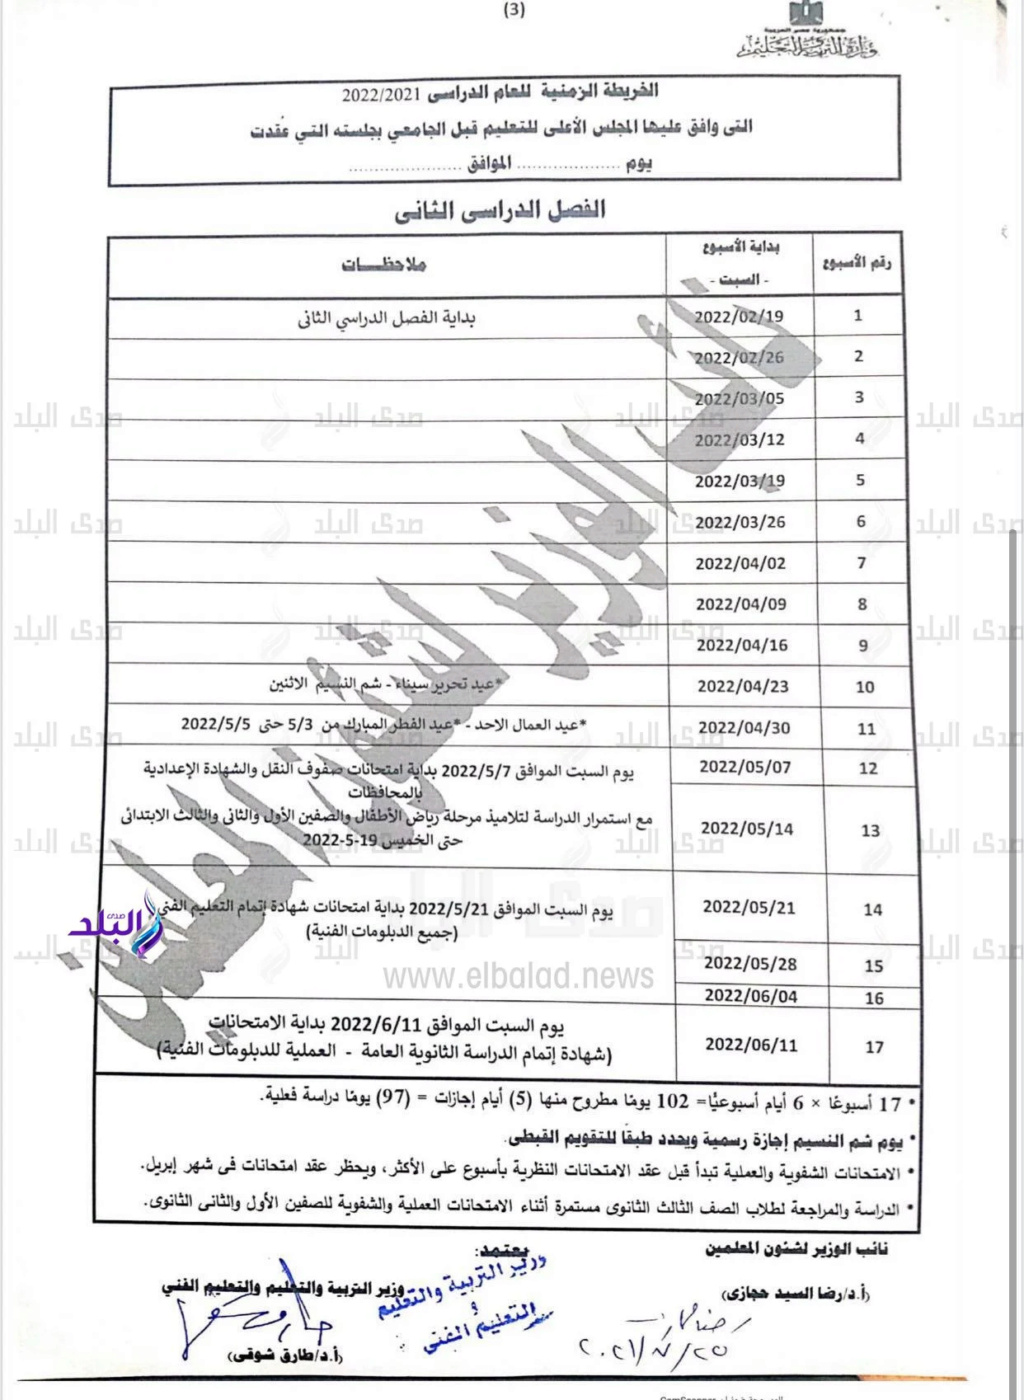 طارق شوقي يصدر  قرار رسمي بحظر عقد امتحانات في شهر ديسمبر2021 797_we10